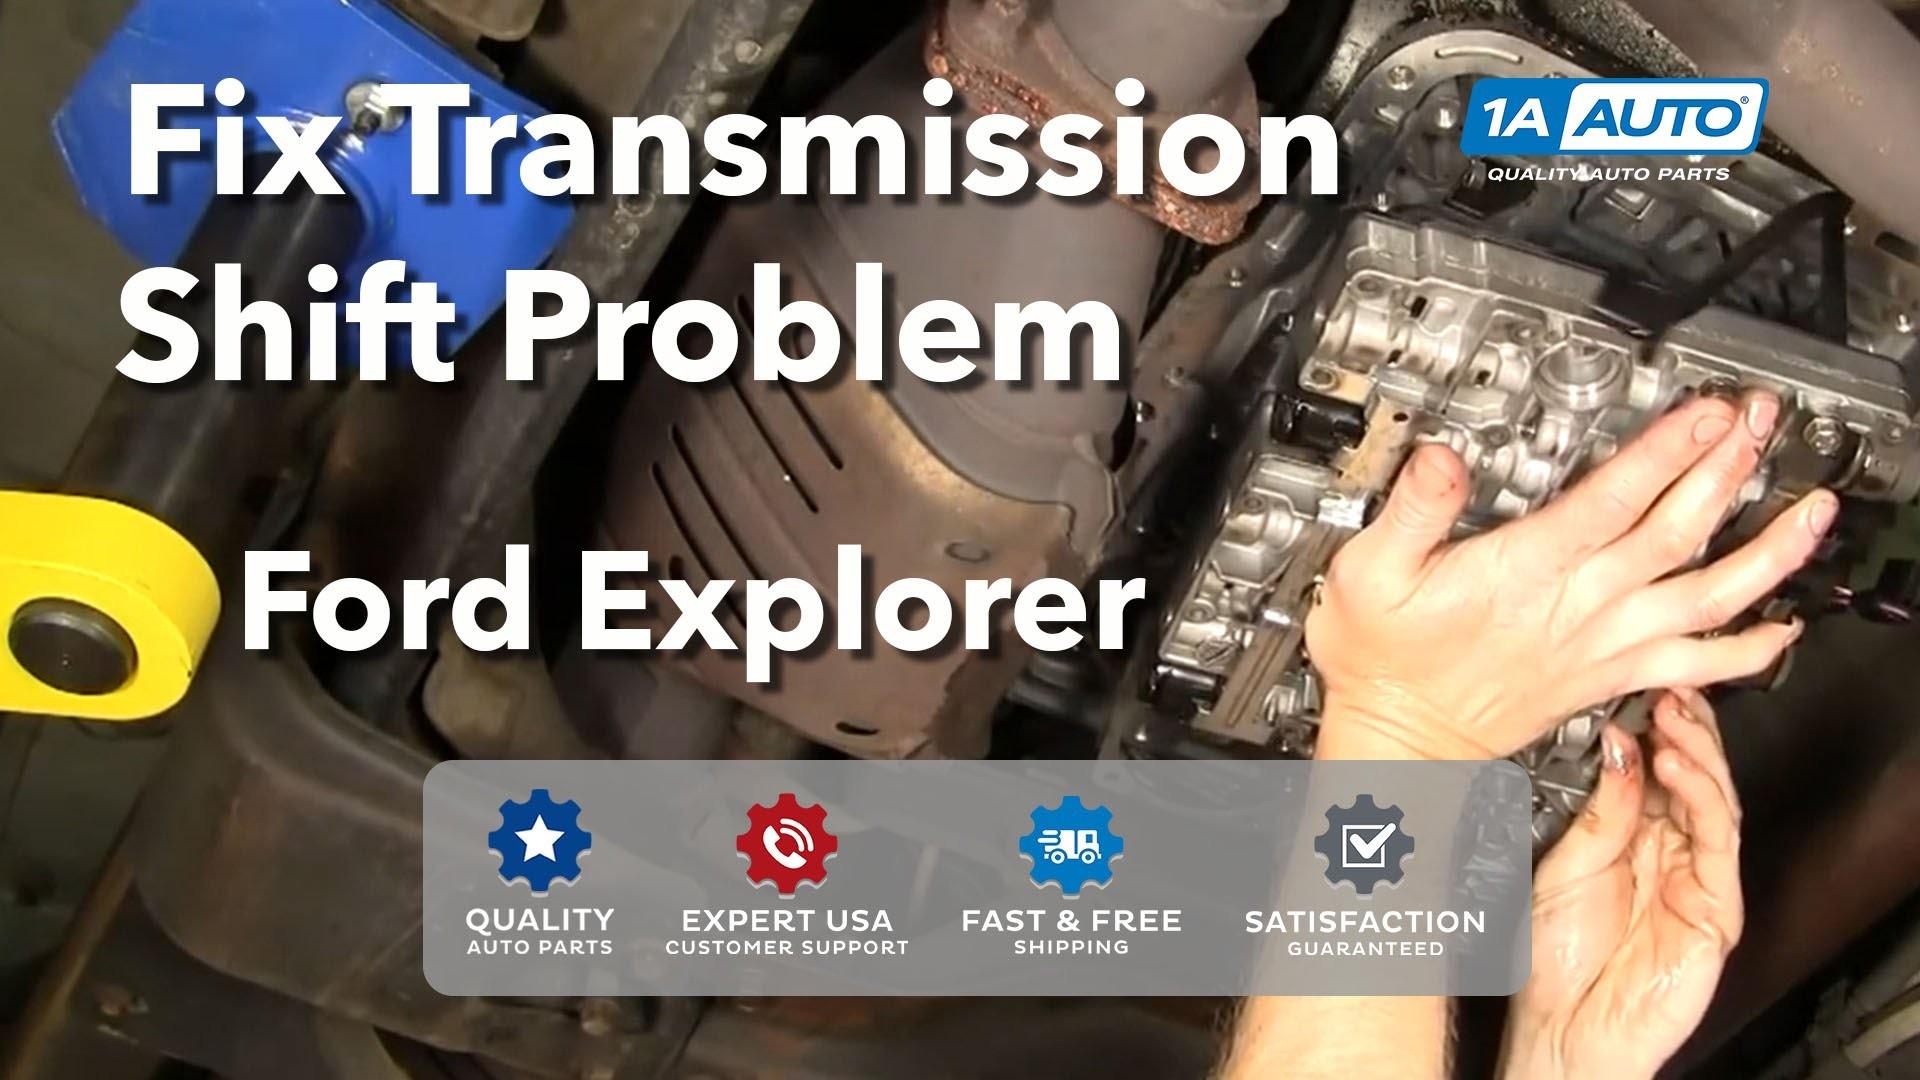 2001 ford Explorer Sport Engine Diagram Auto Repair Fix Transmission Shift Problem ford 5r55e Explorer Buy Of 2001 ford Explorer Sport Engine Diagram